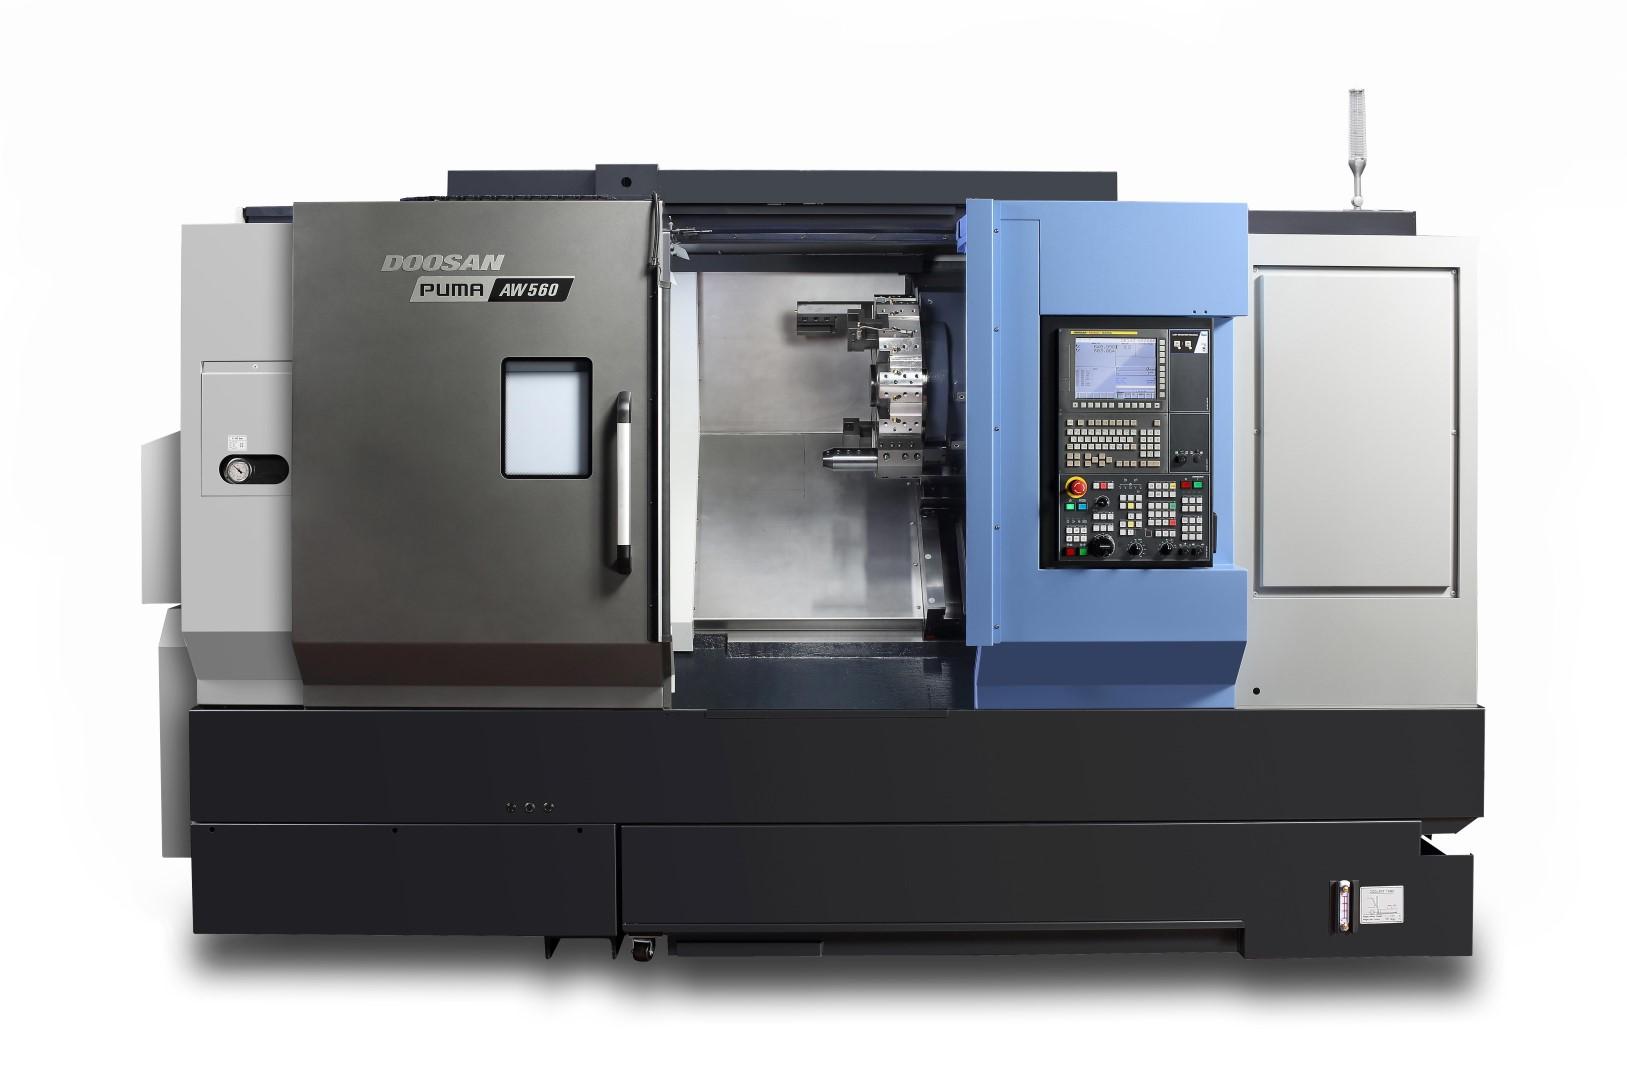 Doosan PUMA AW560 II, AW560-MF II, AW660 II